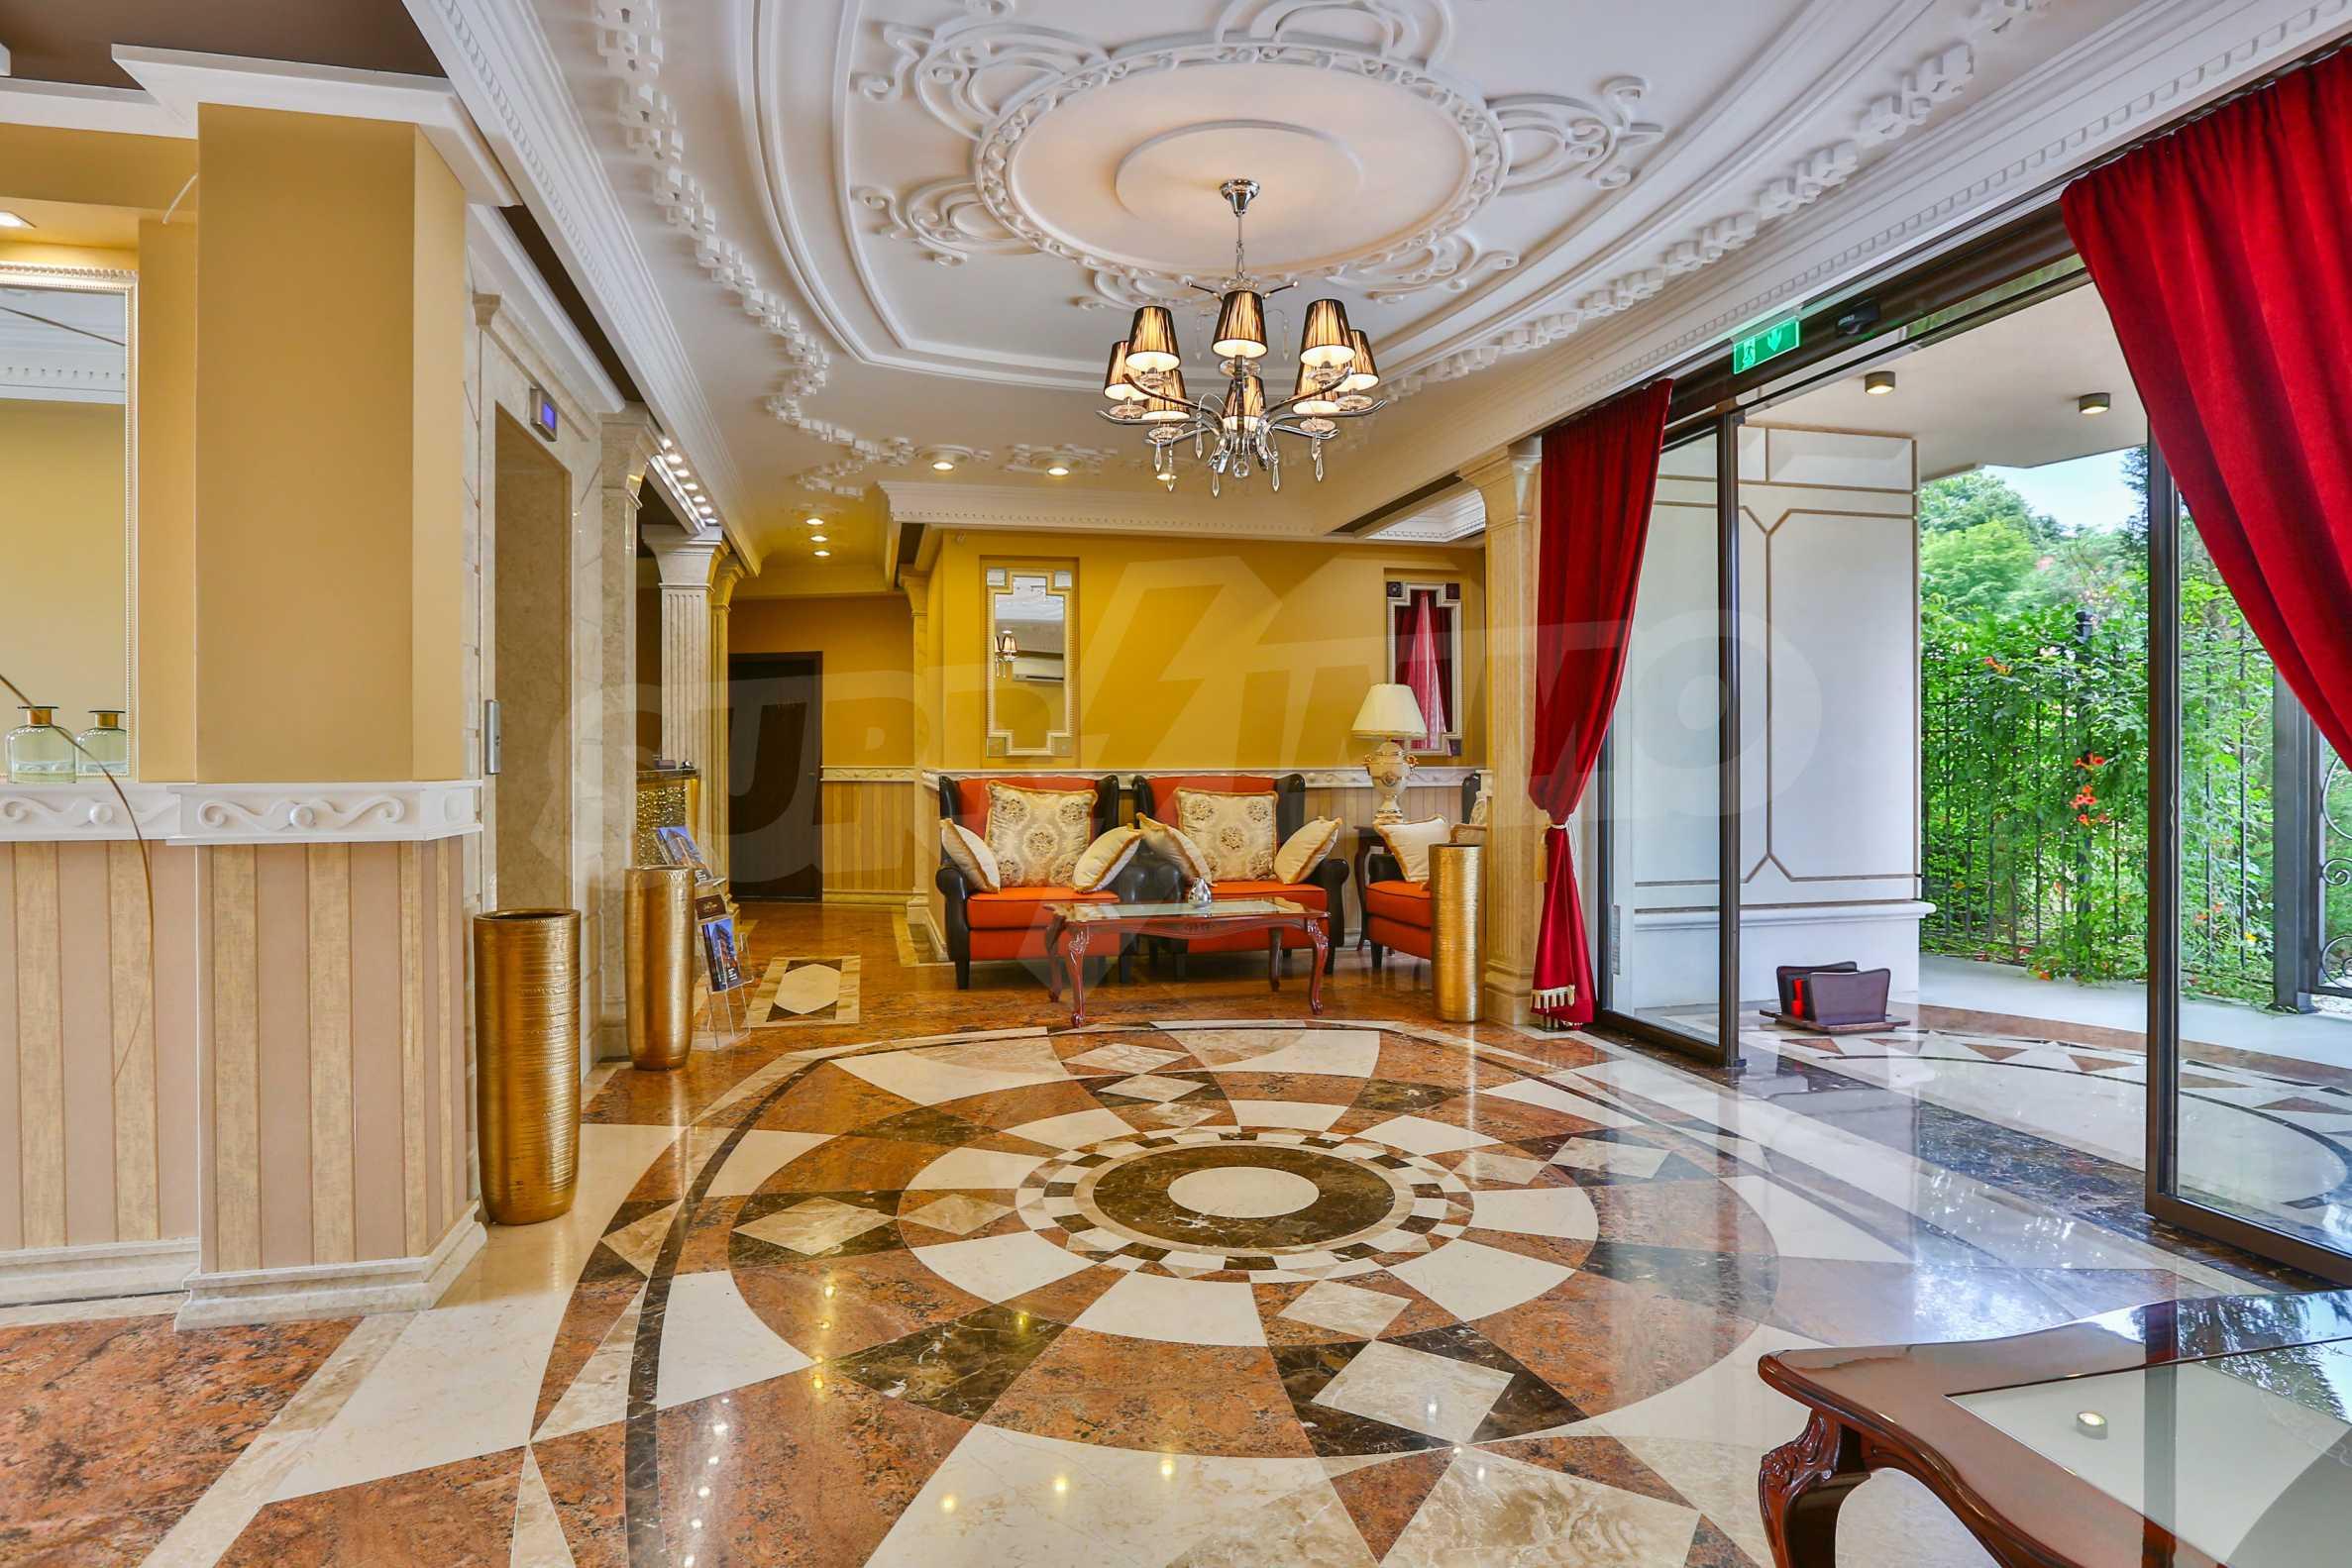 Дизайнерски тристаен апартамент под наем за летен сезон в резиденция Belle Époque в Лозенец 34